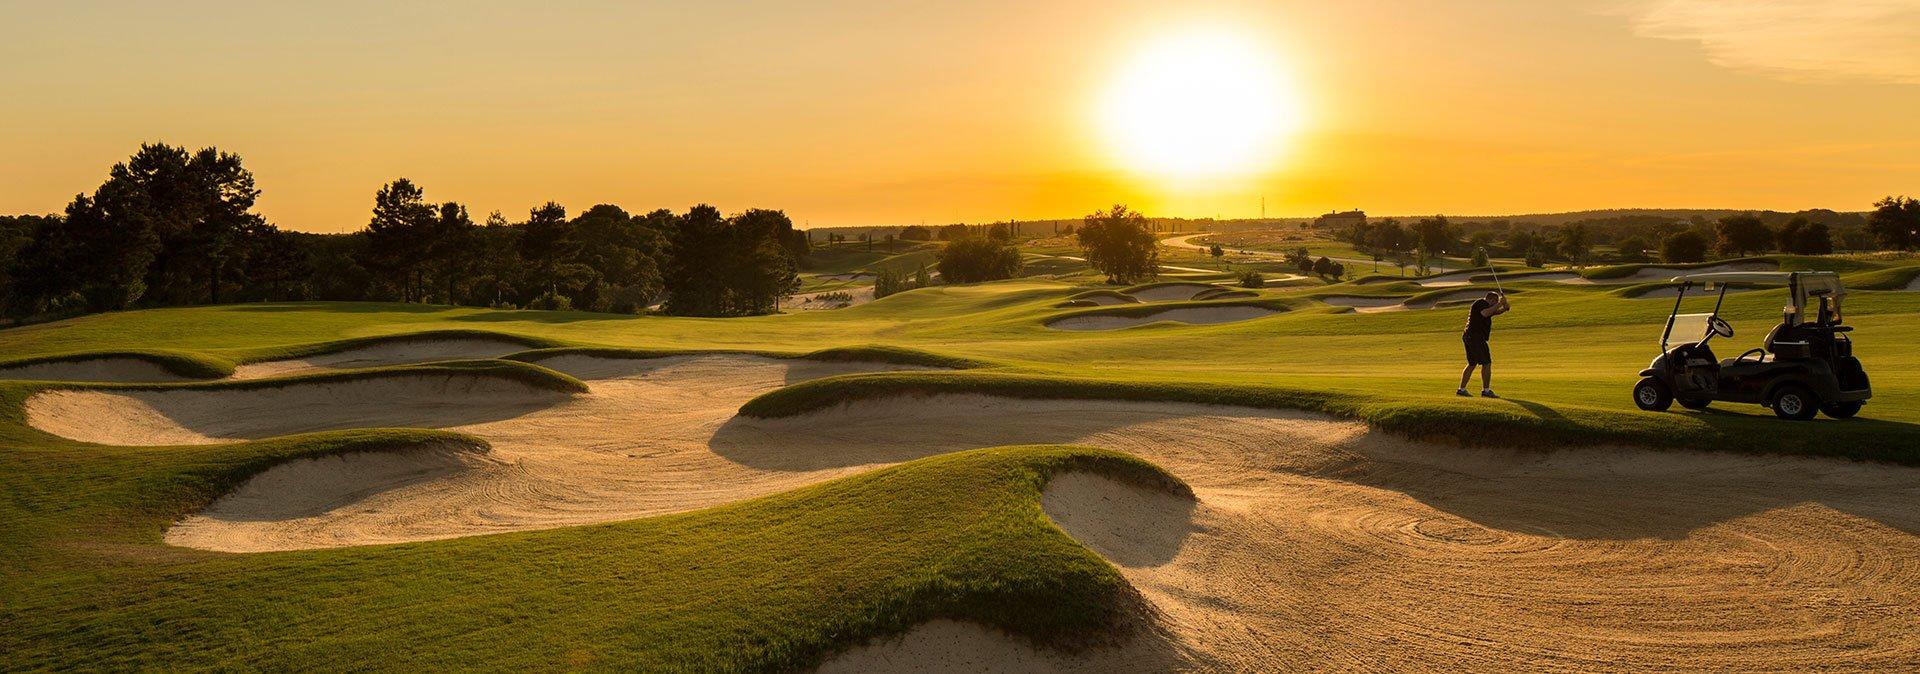 Bella-Collina-Golf-Course-Sunset